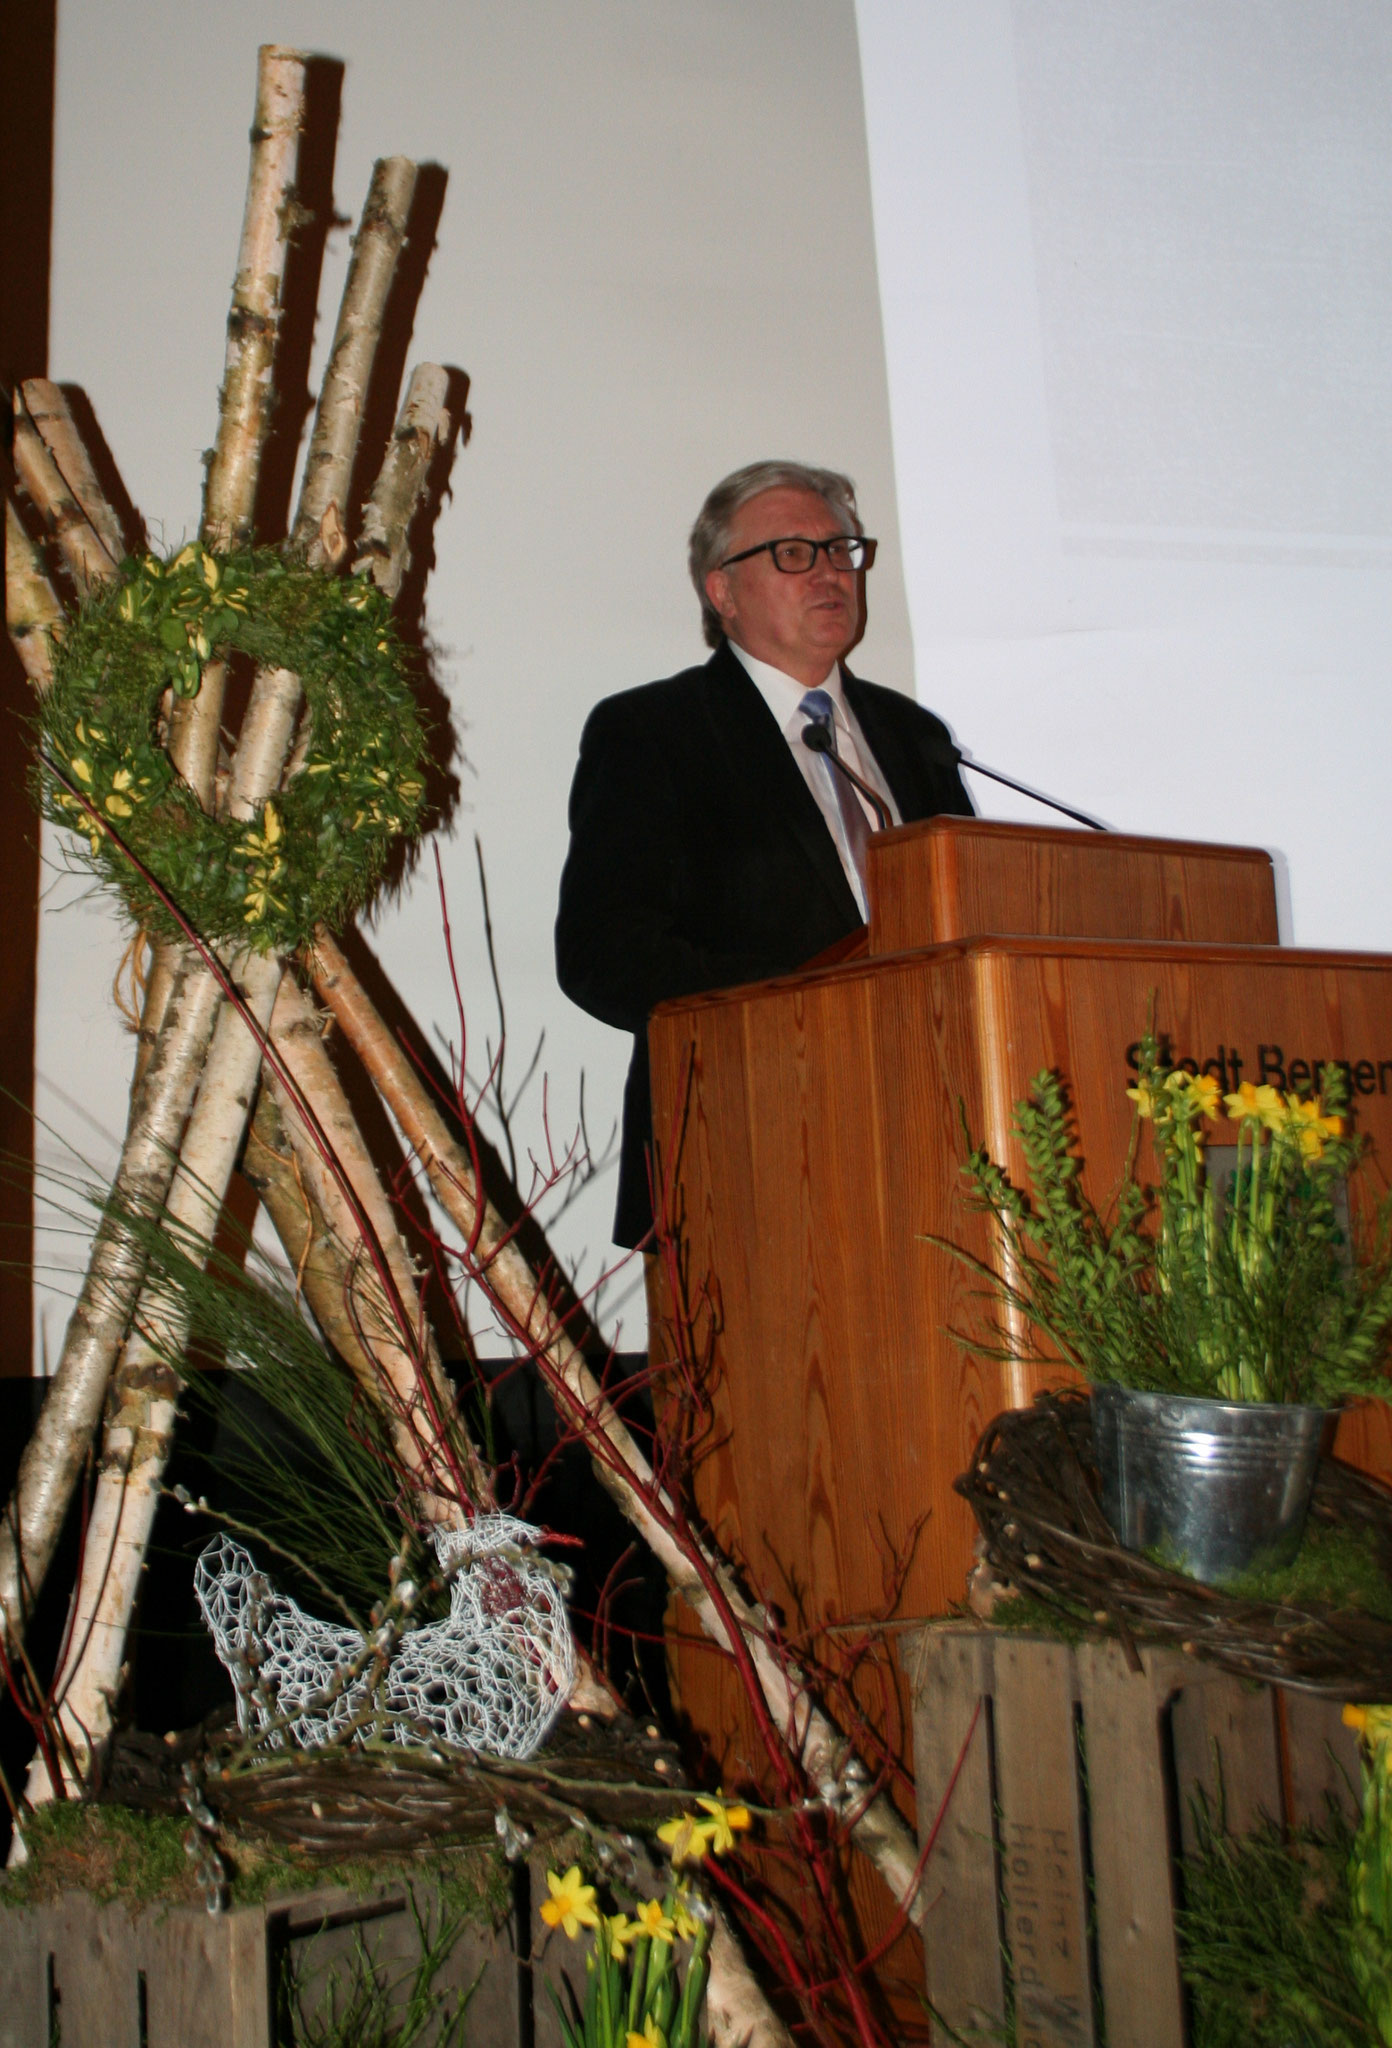 Stellvertretender Landrat Ulrich Kaiser